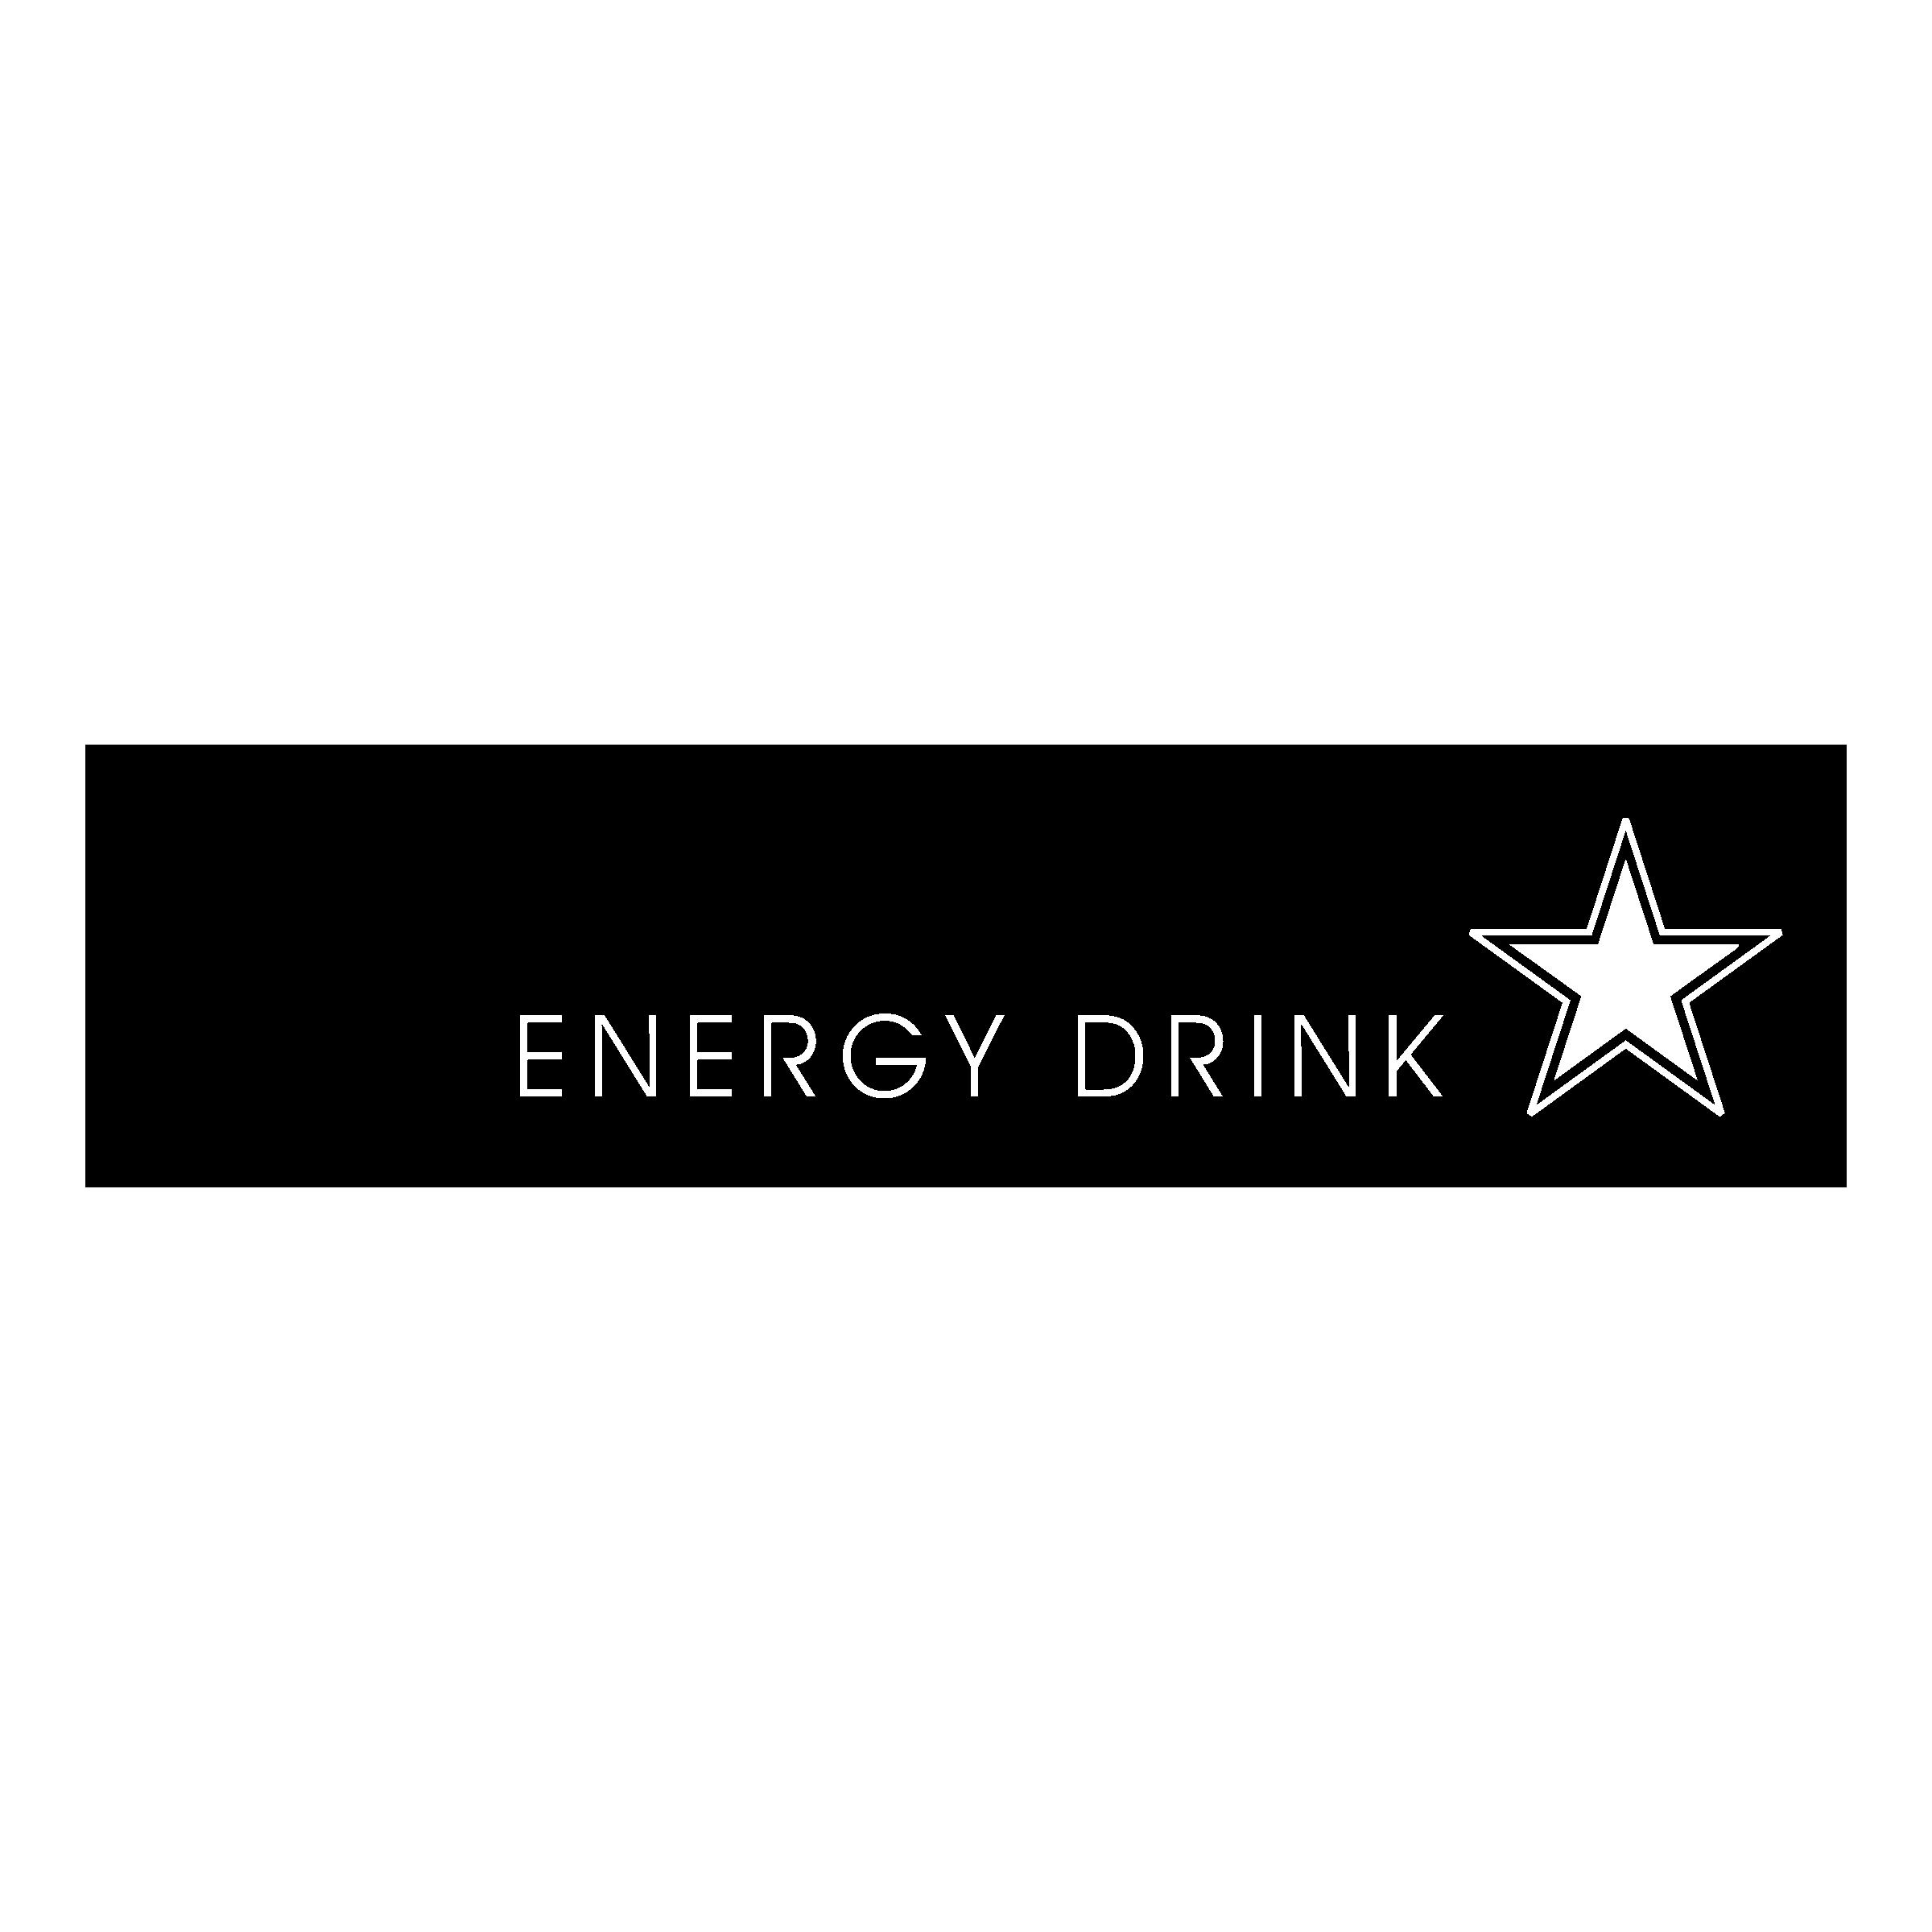 Rockstar energy drink logo black and white